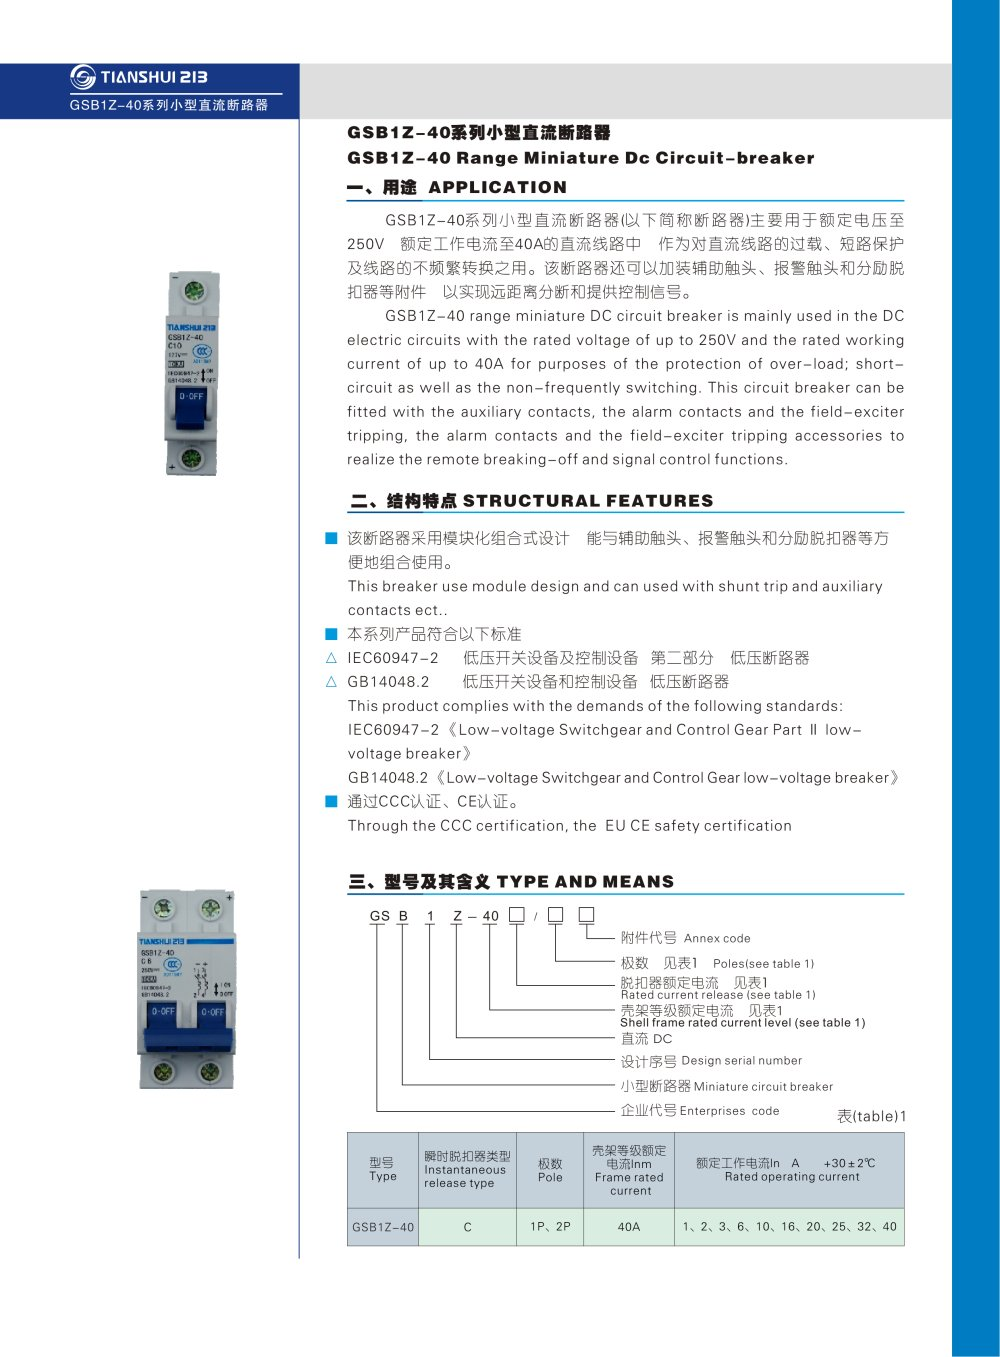 Gsb1z 40 Dc Mini Circuit Breaker Tianshui 213 Electrical Apparatus Electric Circuits 1 4 Pages